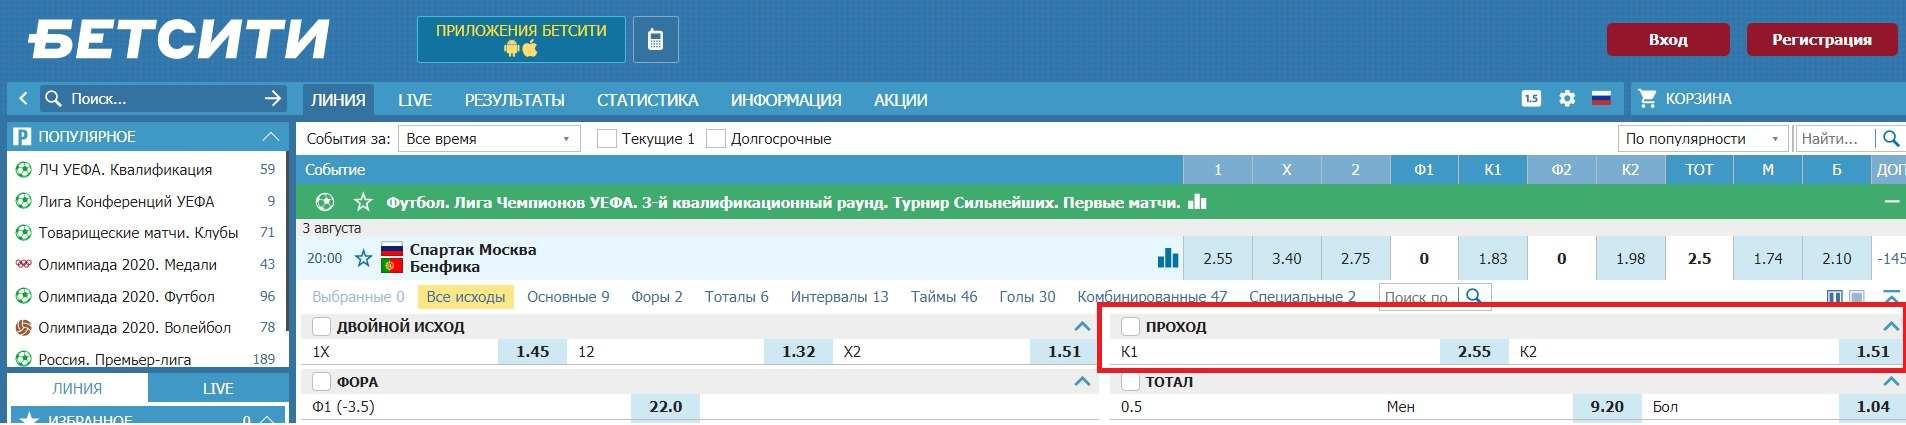 betcity ru stavki na prohod komandy futbol liga chempionov uefa